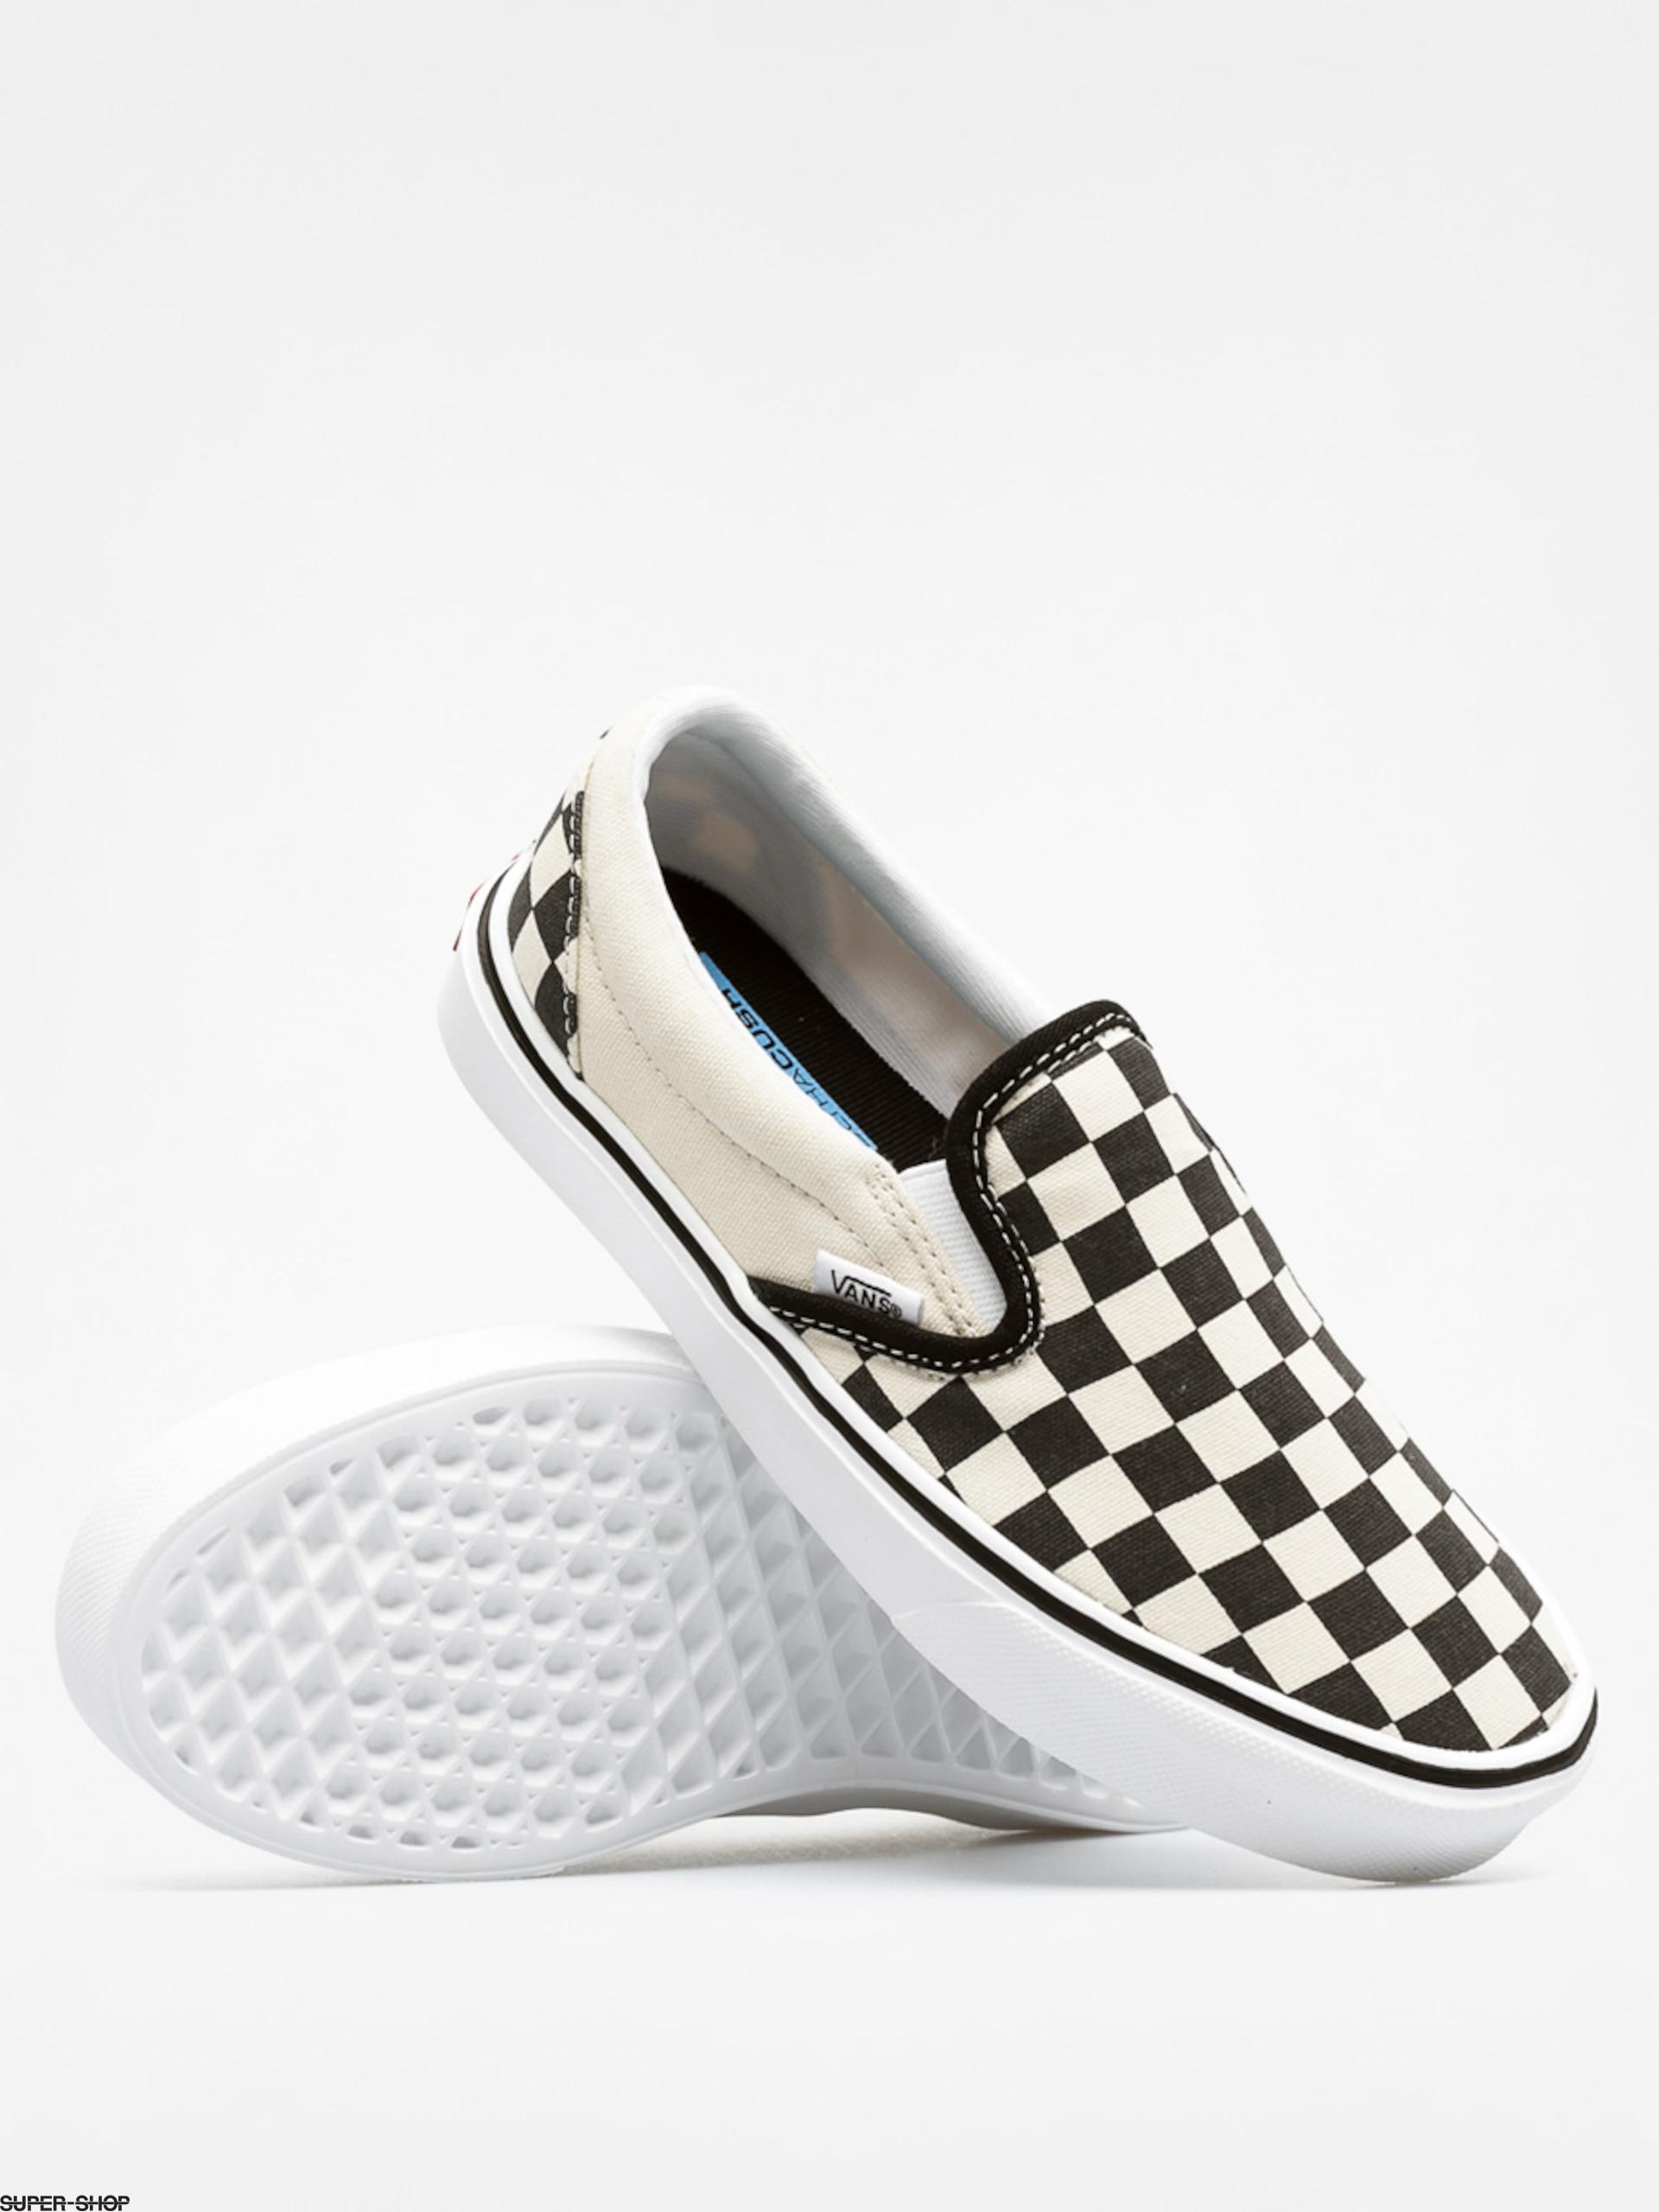 8f8e3c60a6 Vans Shoes Slip On Lite (checkerboard black classic white)